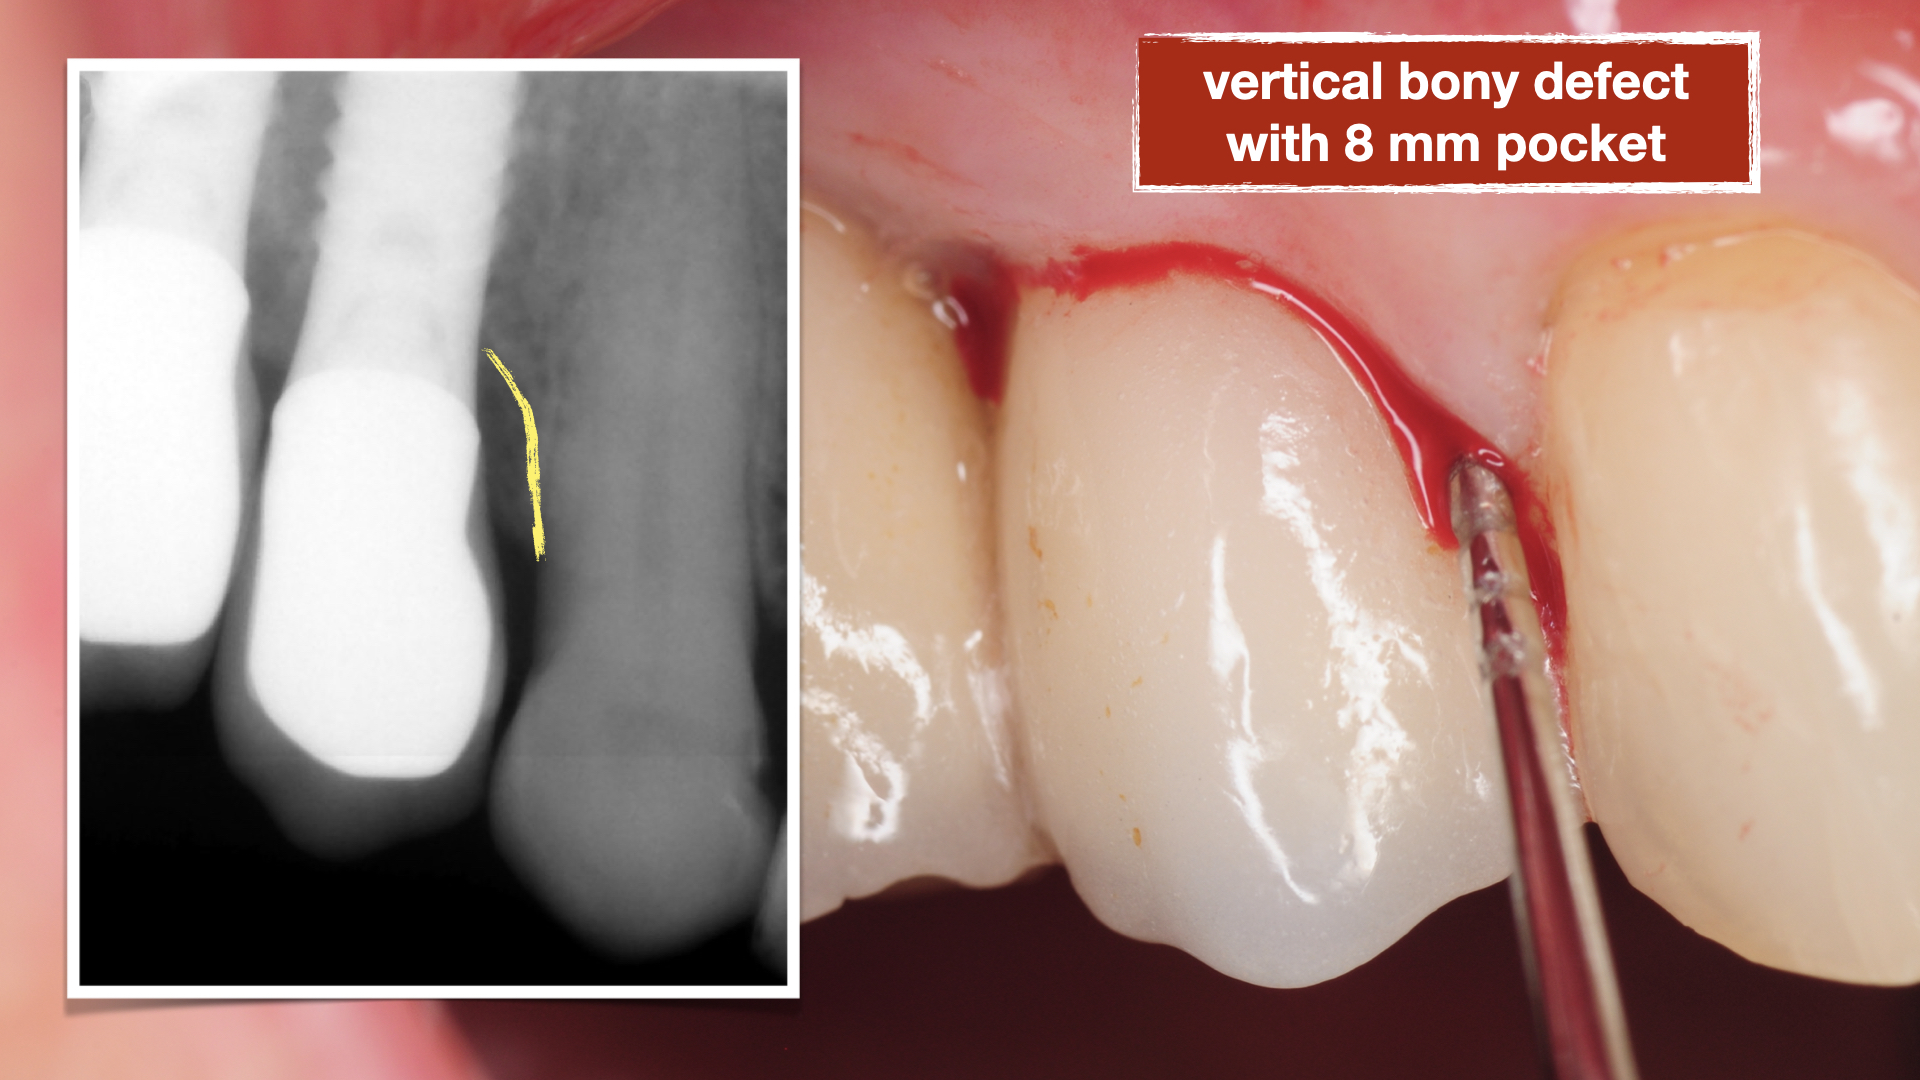 chronic-pain-dental-implant-peri-implantitis-mucositis-airflow-prophylaxis-master-kazemi-oral-surgery-4